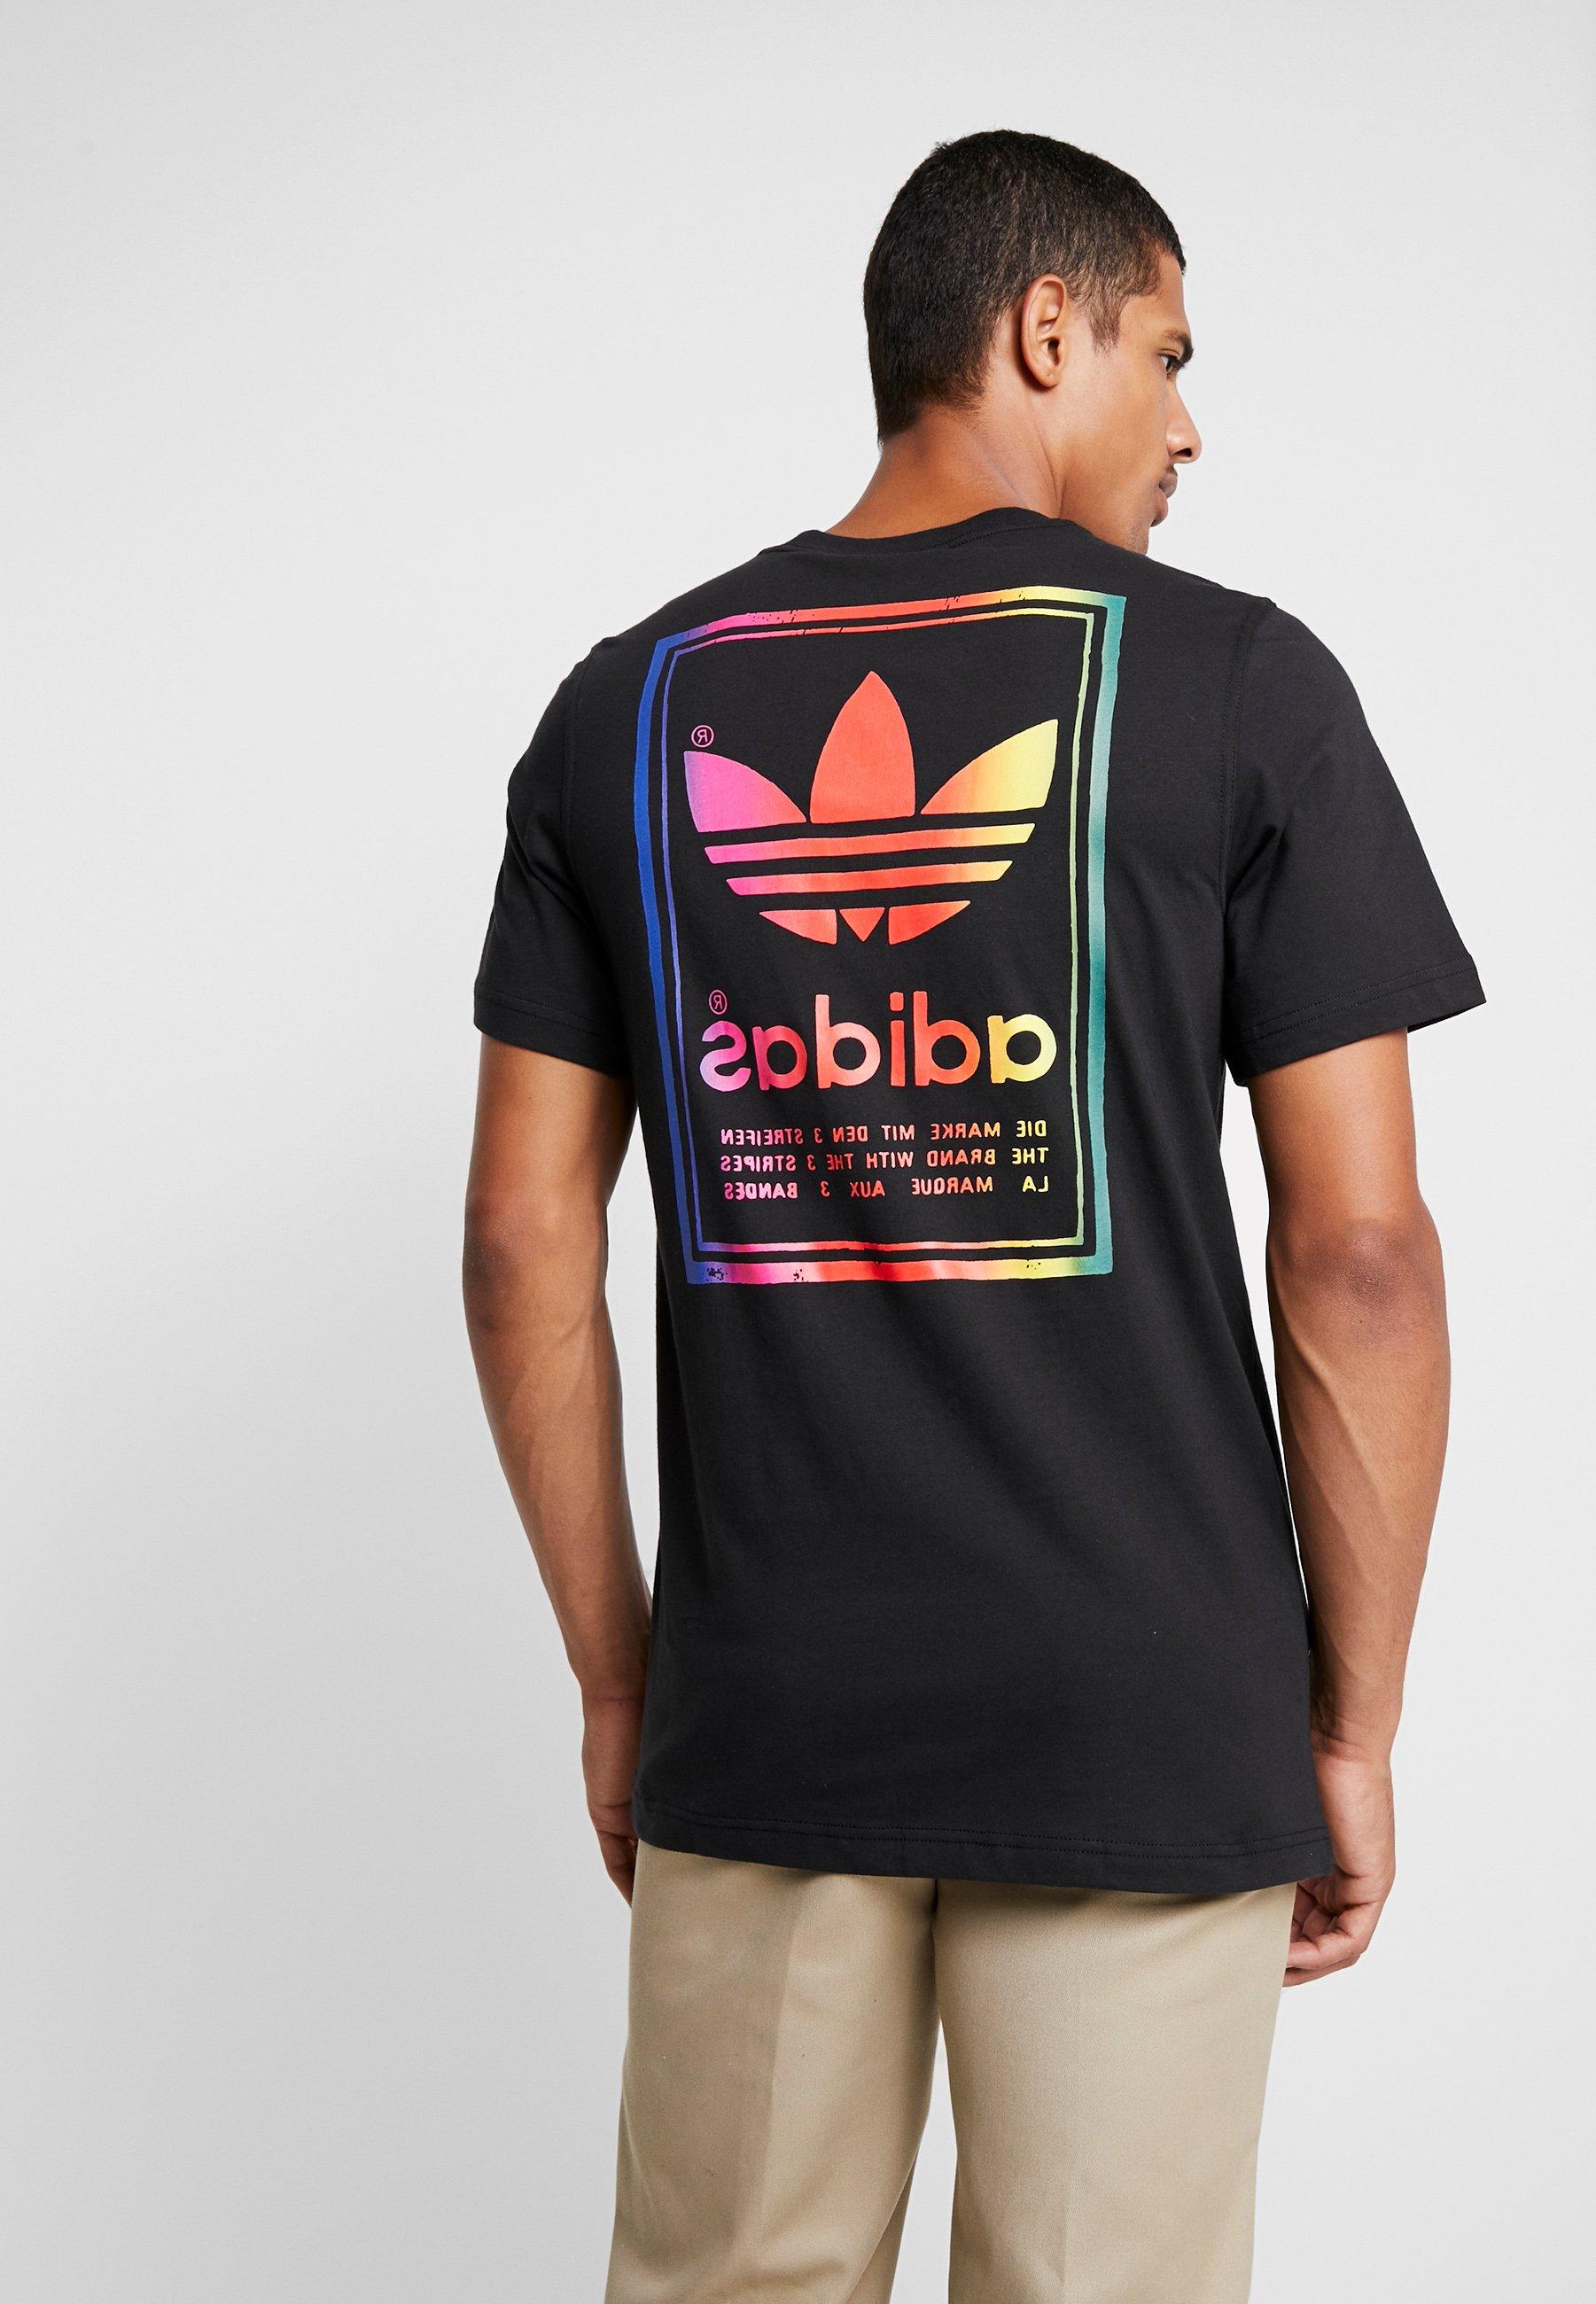 Imprimé Colour multi Originals Black Adidas shirt TeeT Vintage eCordxB